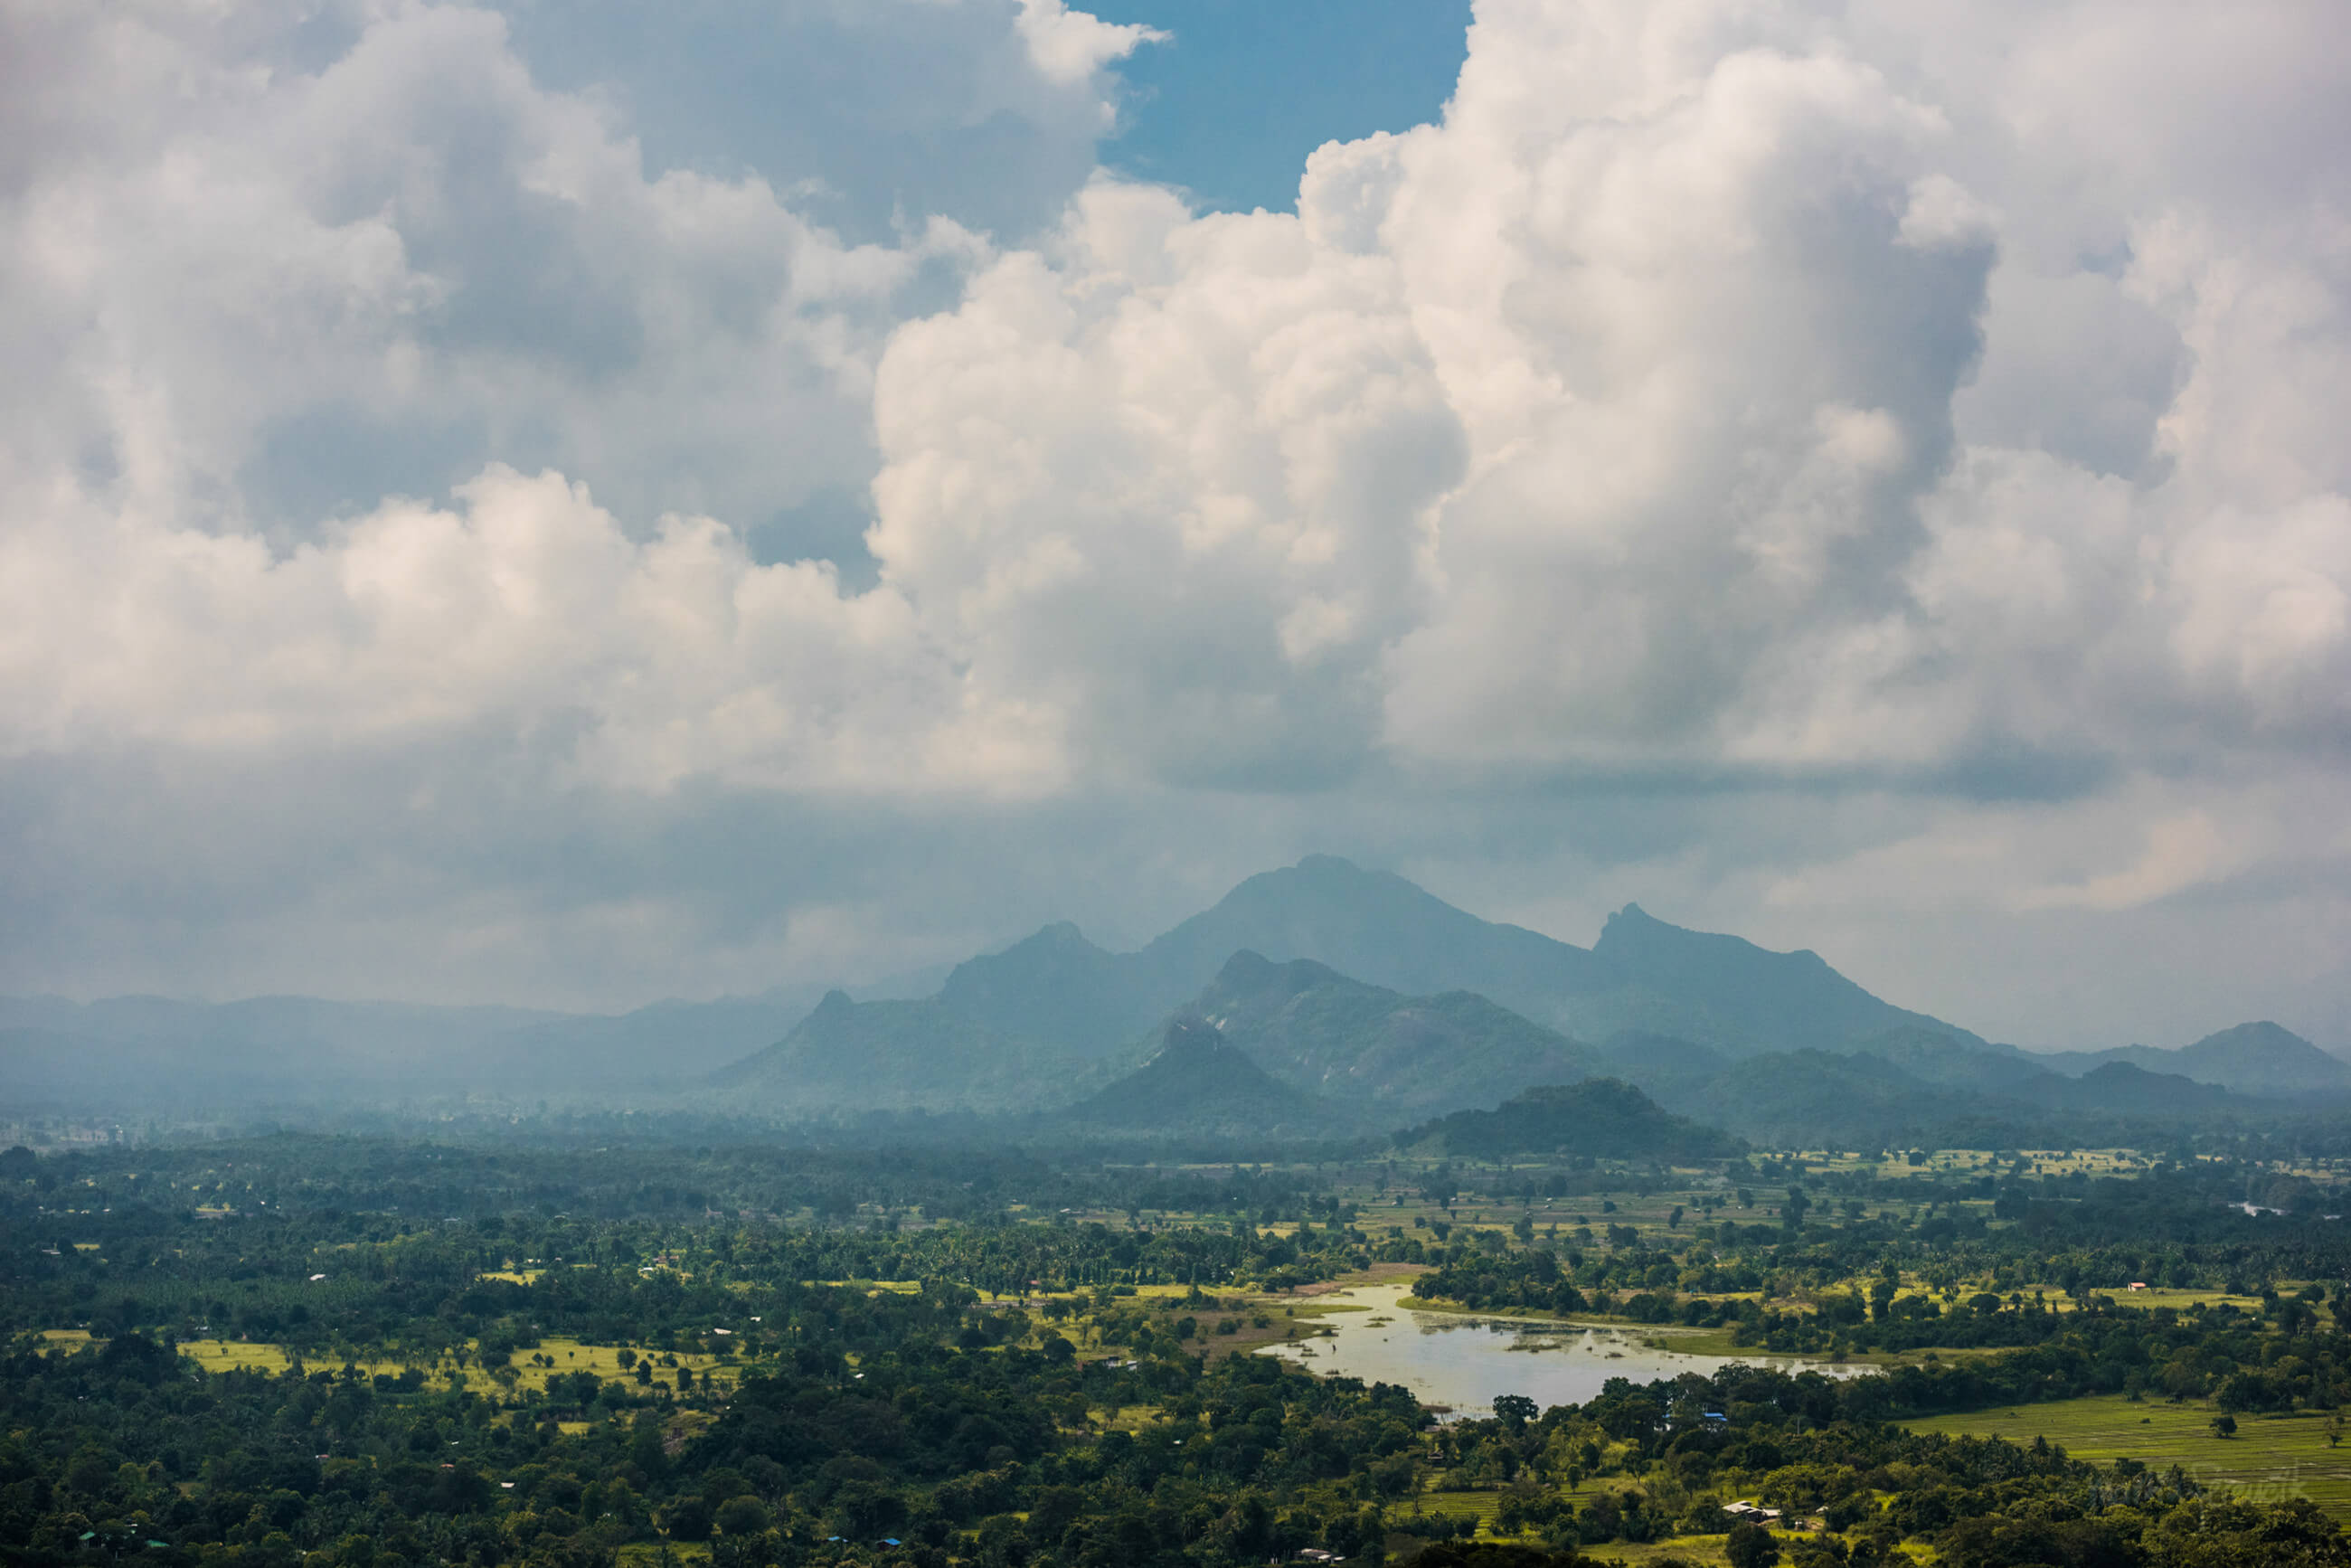 https://bubo.sk/uploads/galleries/5058/martinferencik_srilanka_dsc9878.jpg